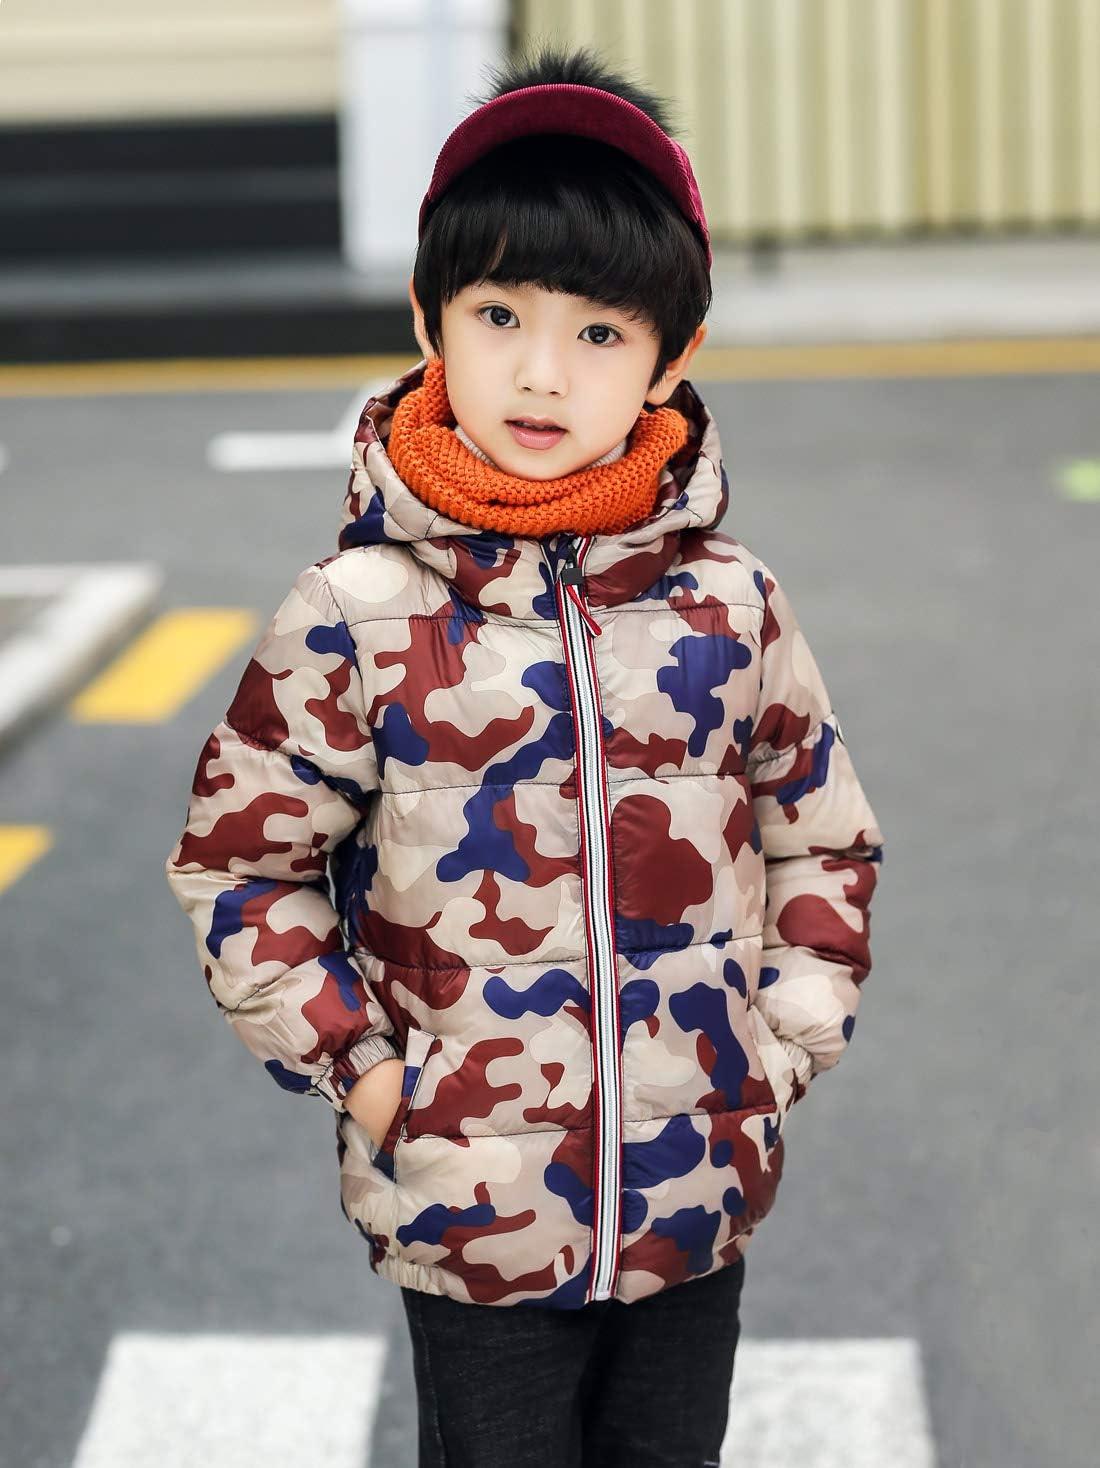 AIEOE Baby Boys Down Coats Lightweight Winter Puffer Hooded Jackets 1-5 Years